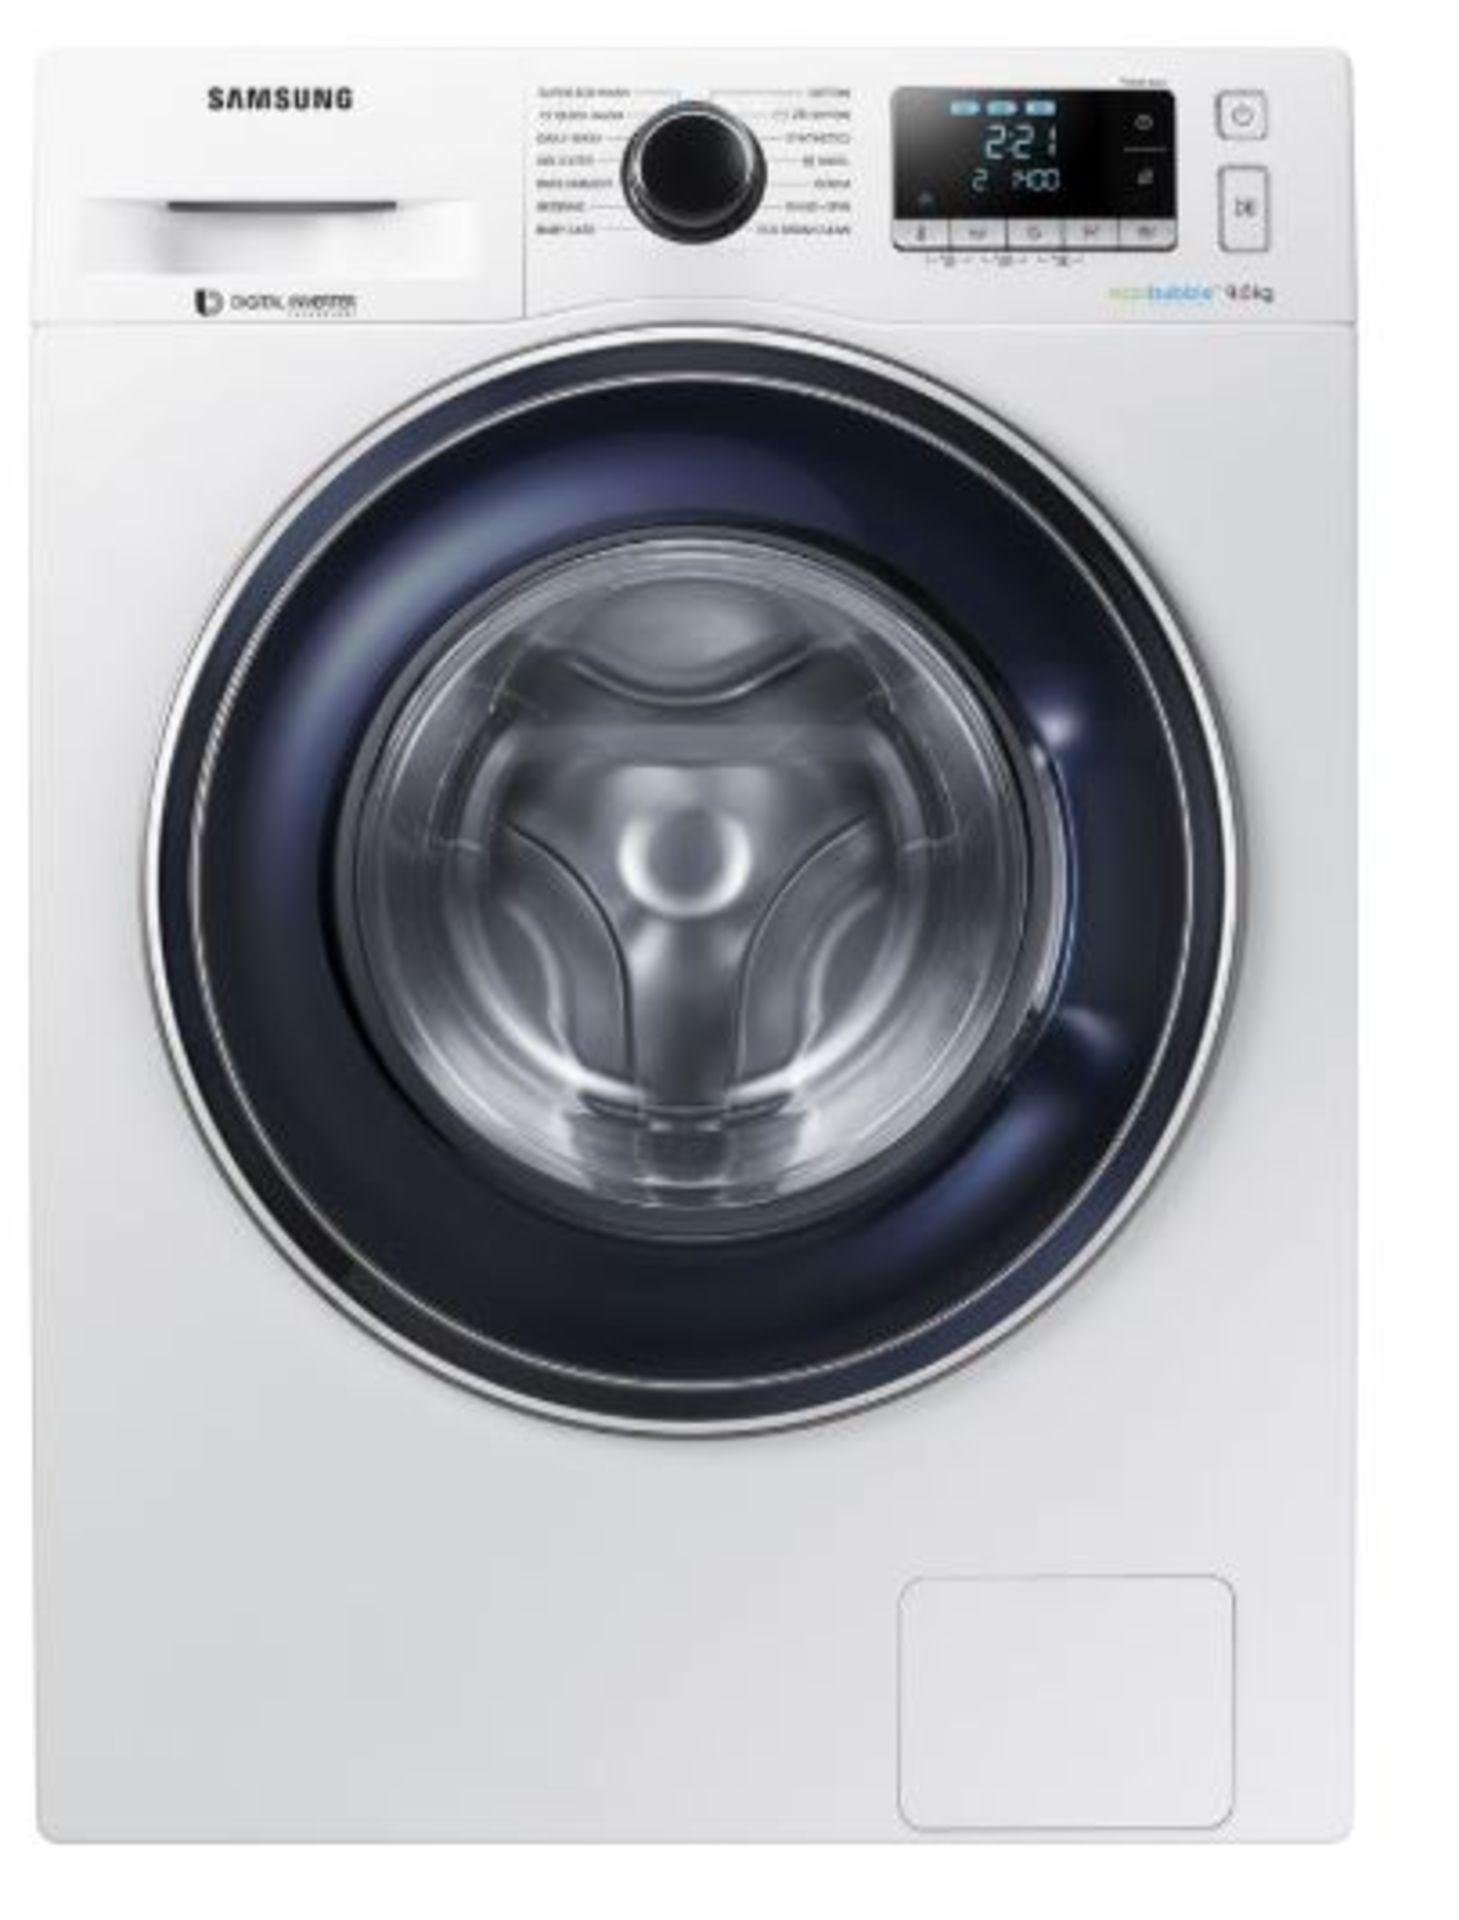 Pallet of 2 Samsung Premium Washing machines. Latest selling price £738 - Image 3 of 8